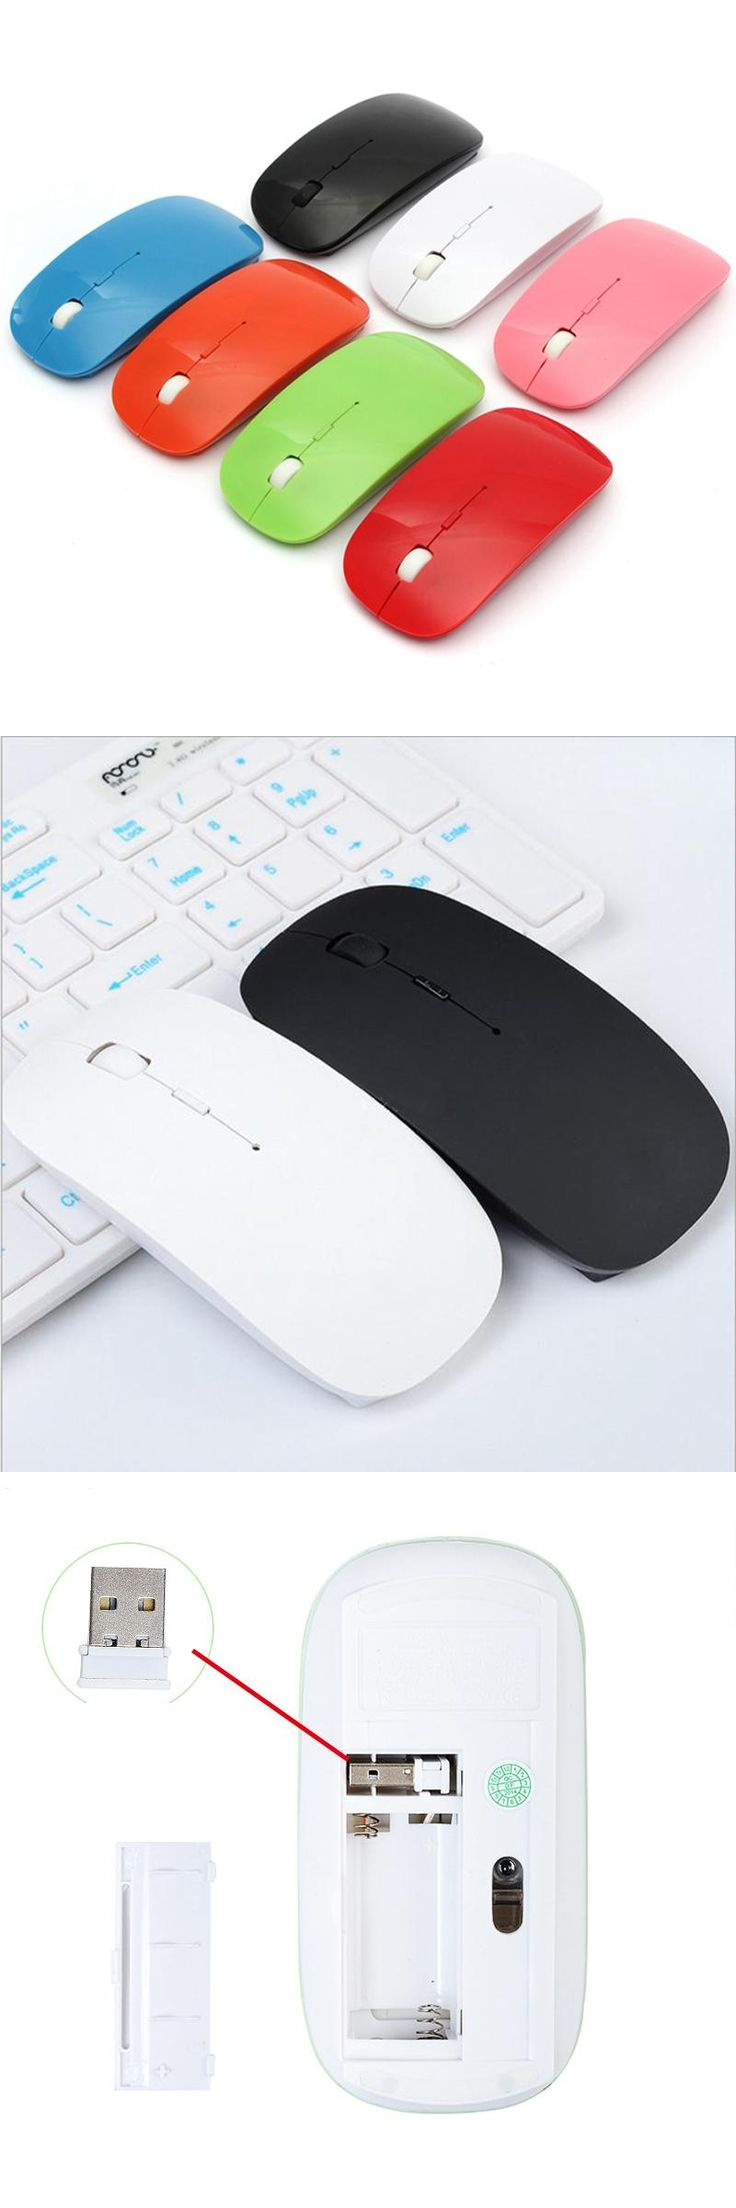 [Visit to Buy] Top Selling USB Optical Wireless Computer 1600 DPI Mouse 2.4G Receiver Super Slim Mouse For PC Laptop Desktop Souris Sans Fil #Advertisement